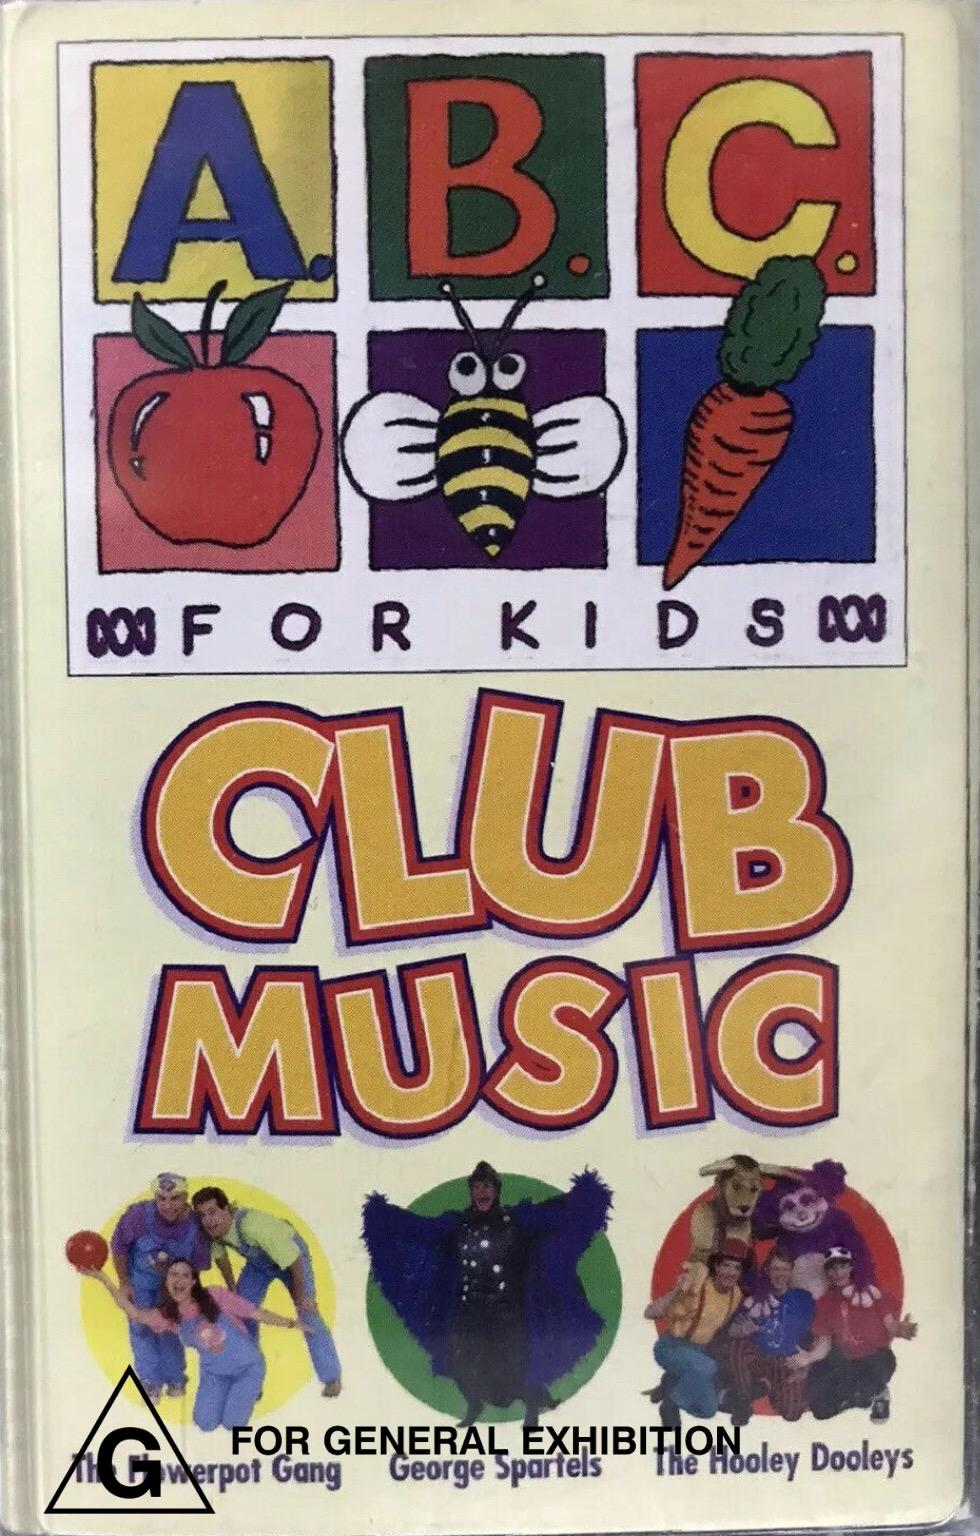 ABC for Kids Club Music 2000 VHS.jpeg